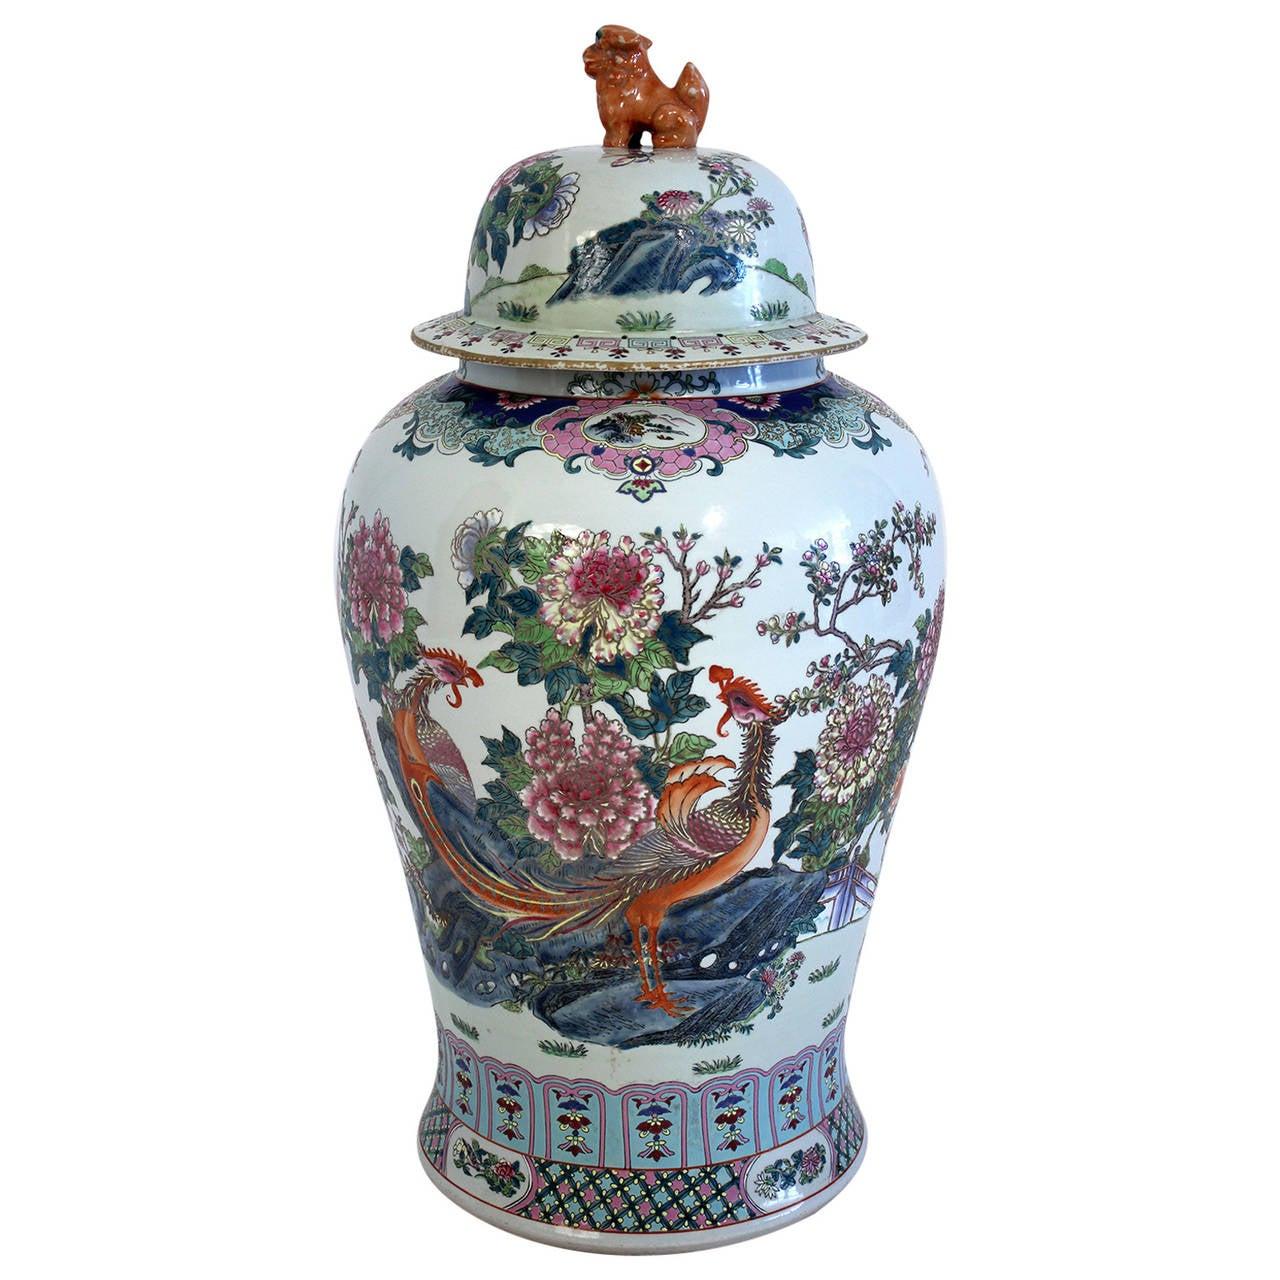 Antique Chinese Lidded Floor Vase For Sale At 1stdibs